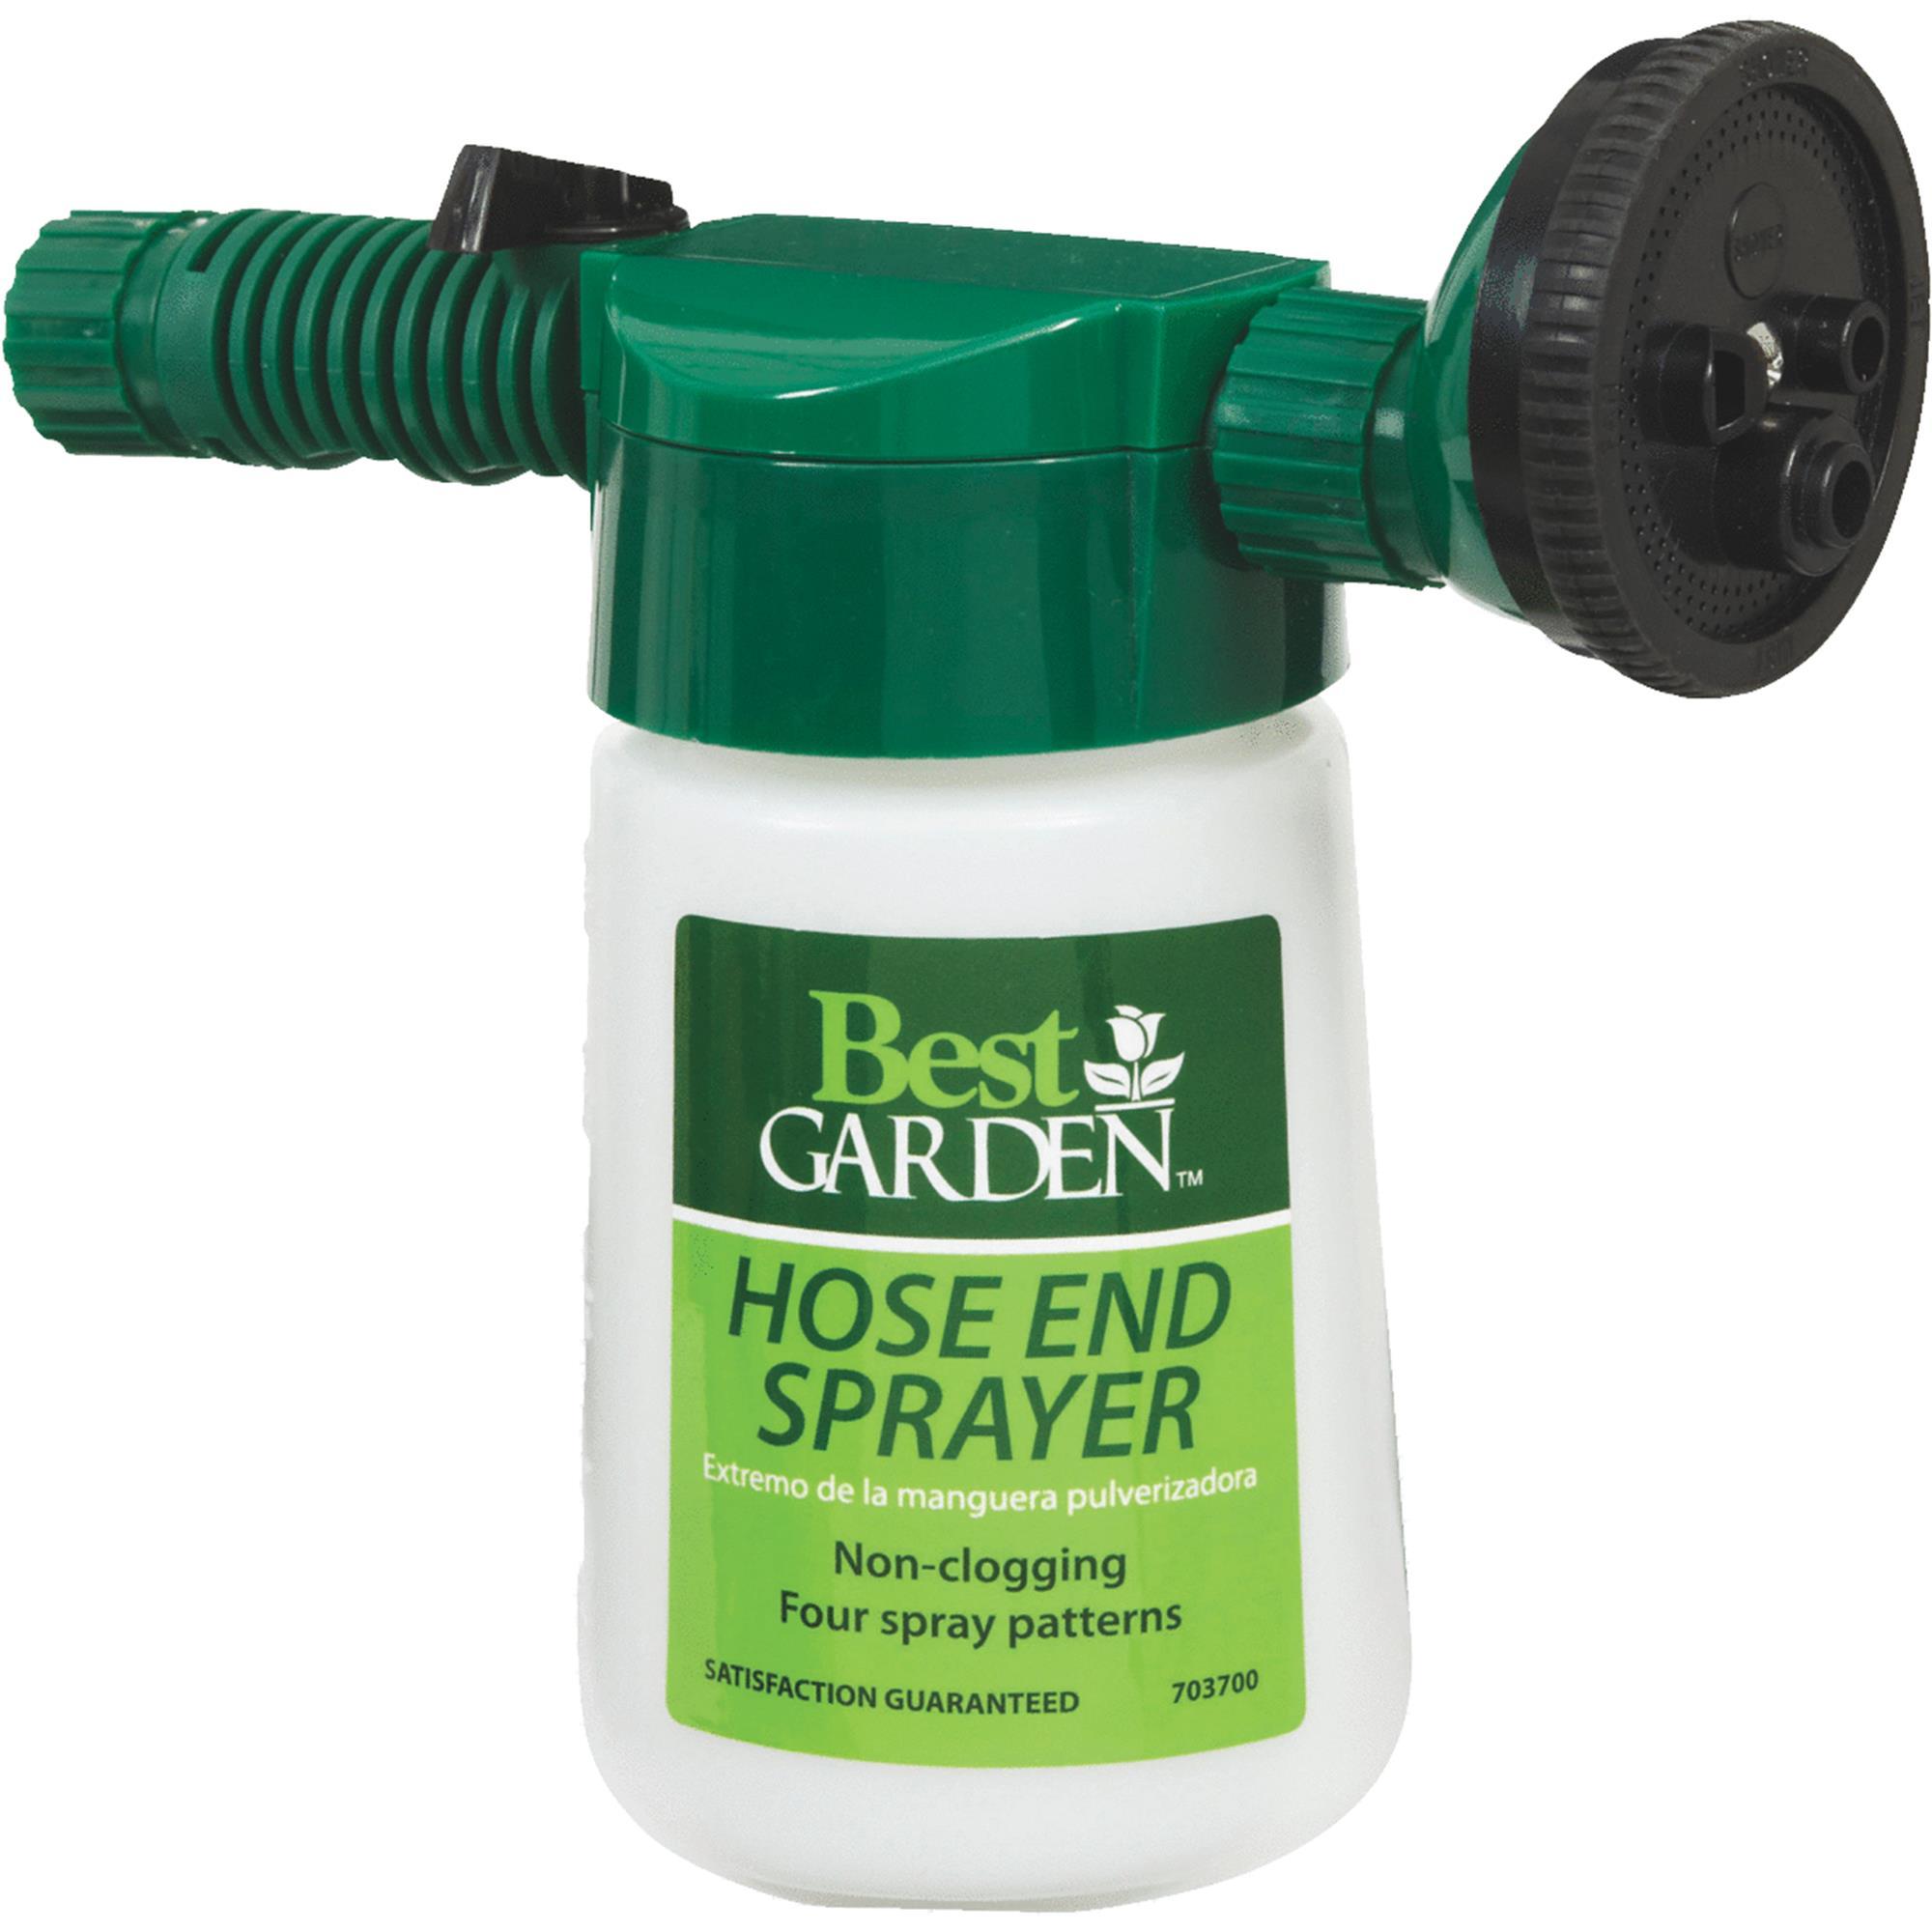 Best Garden Dry Hose End Sprayer by Do it Best Corp.